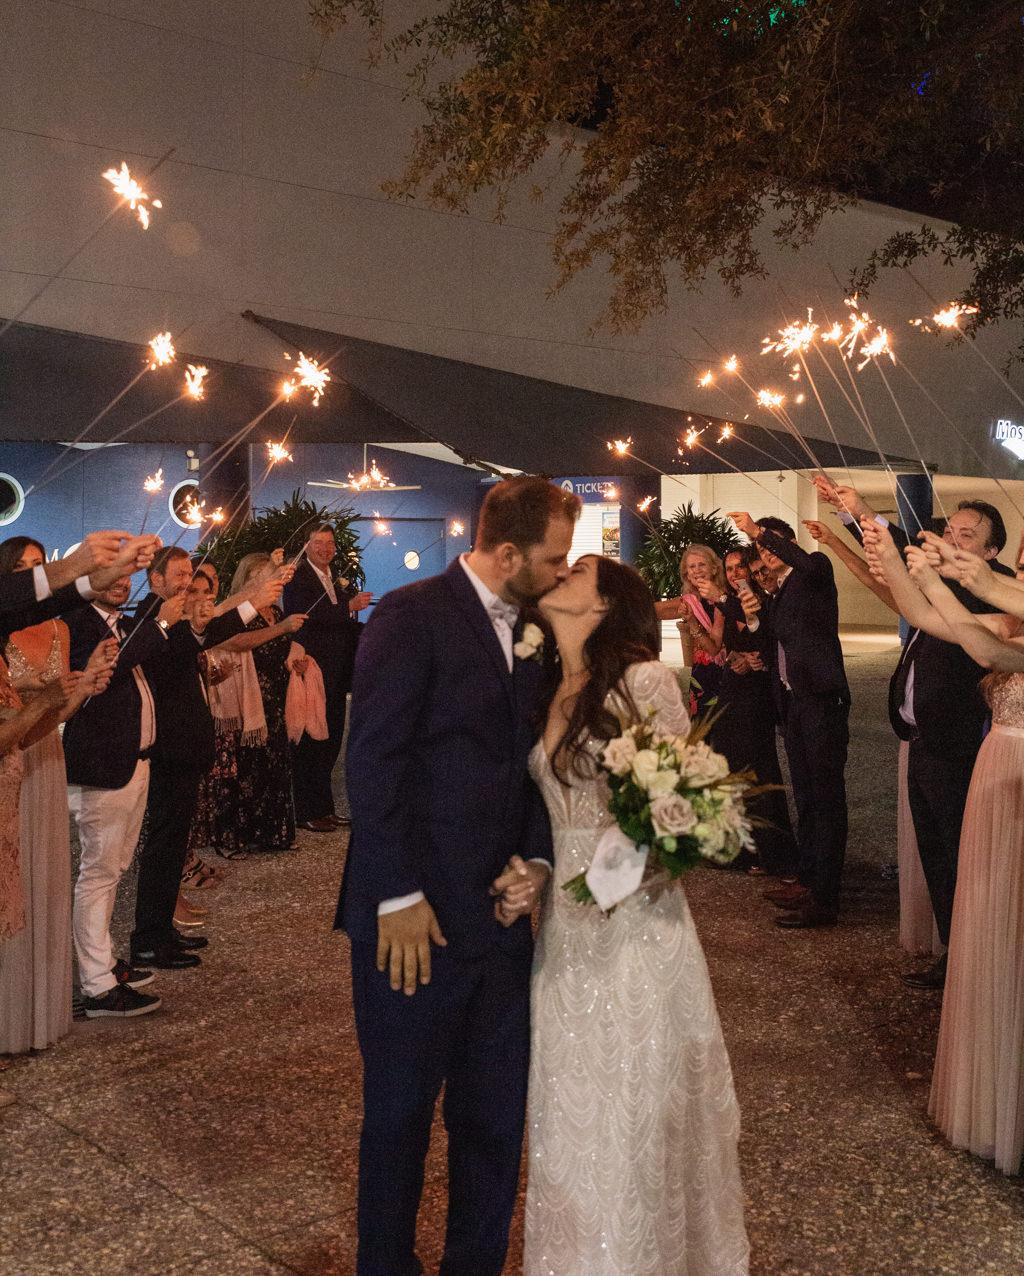 Romantic Bride and Groom Wedding Reception Sparkler Exit Nighttime Portrait